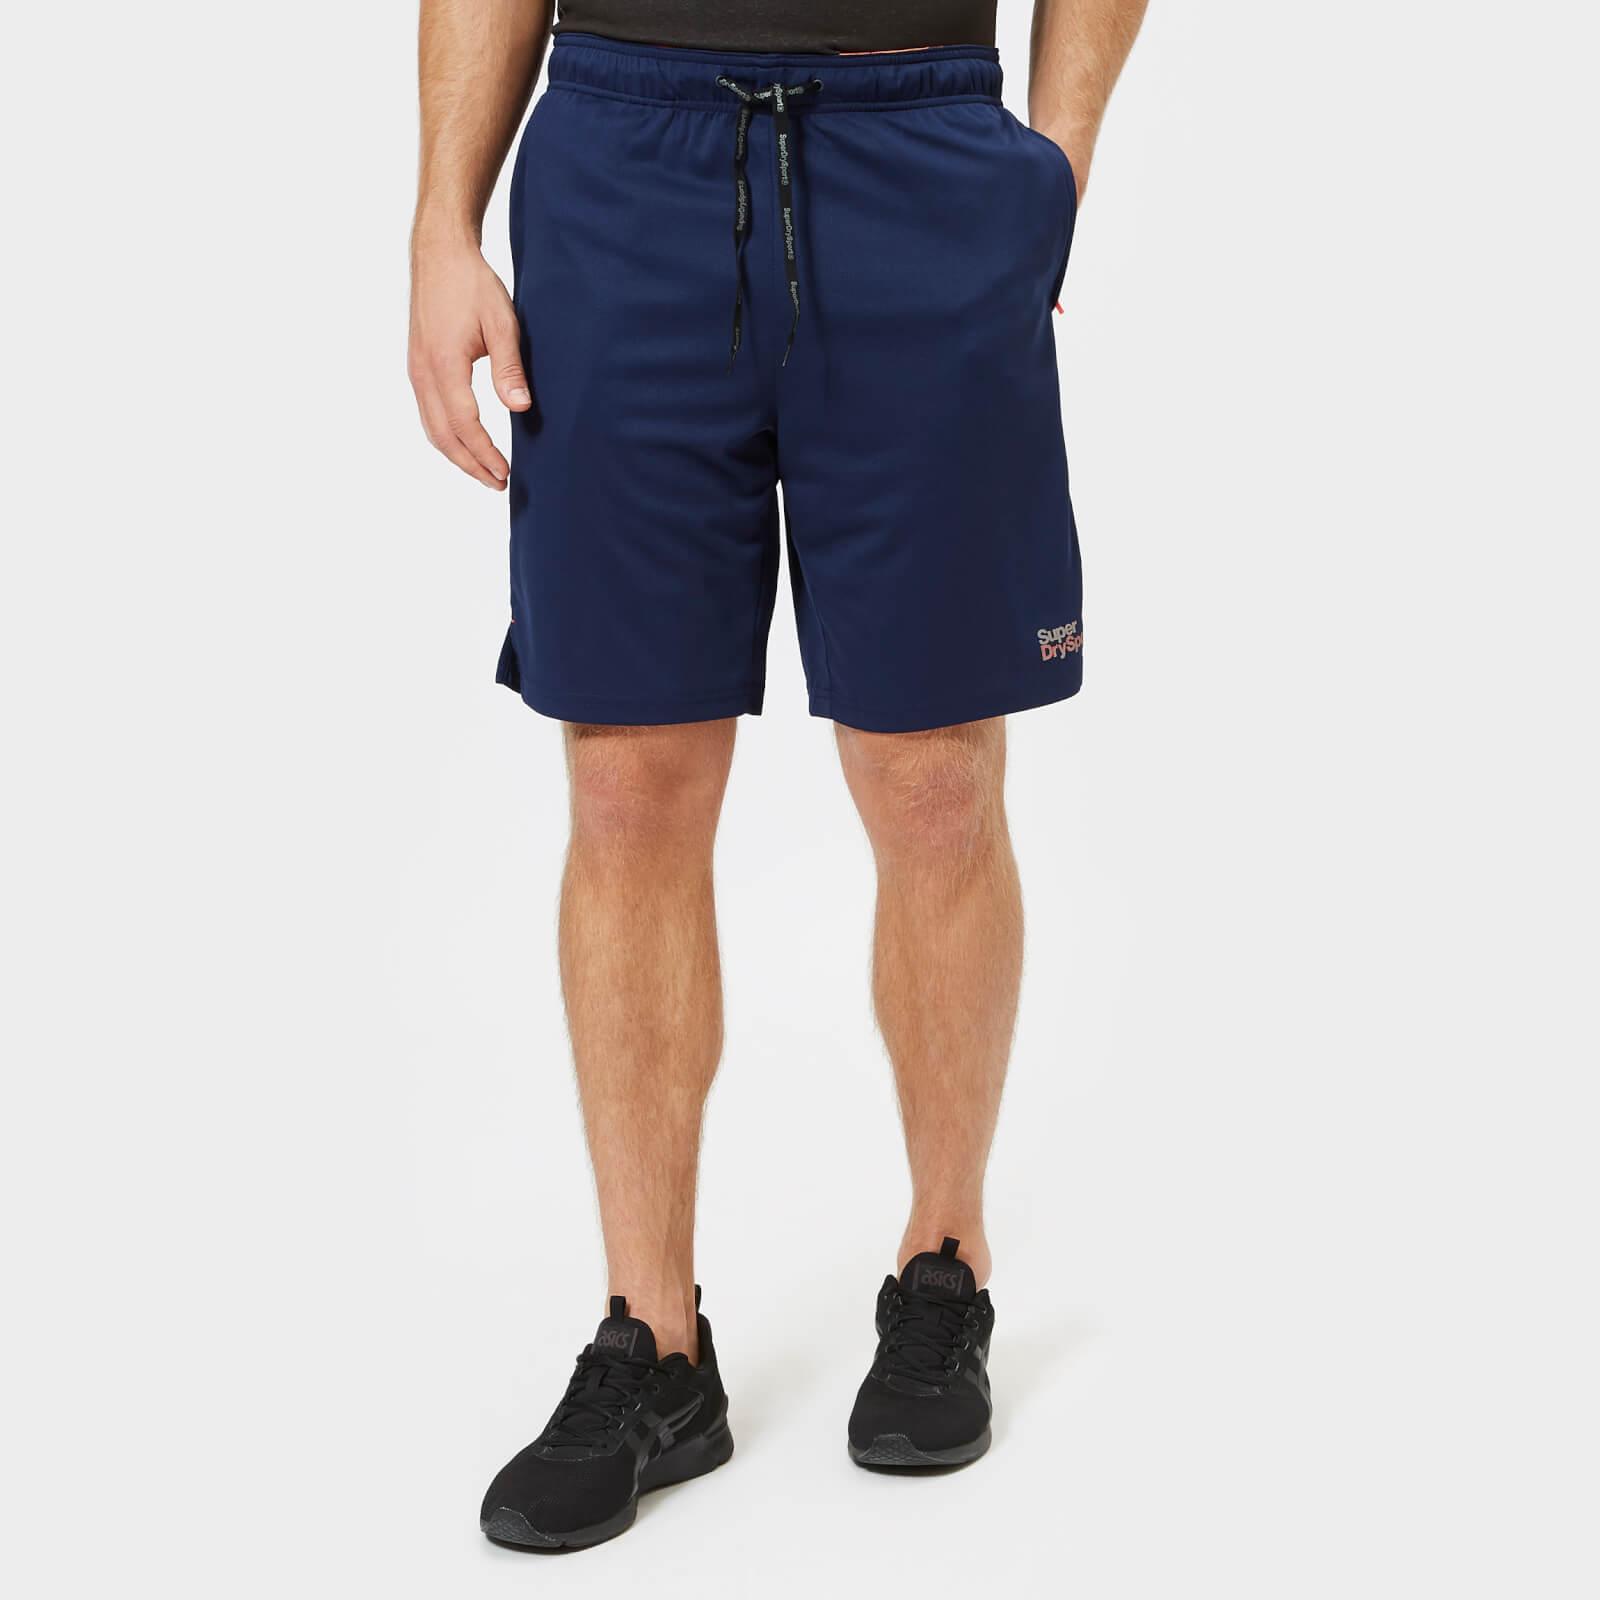 69fb0c9f Superdry Sport Men's Core Train Relax Tricot Shorts - Navy Mens Clothing    TheHut.com